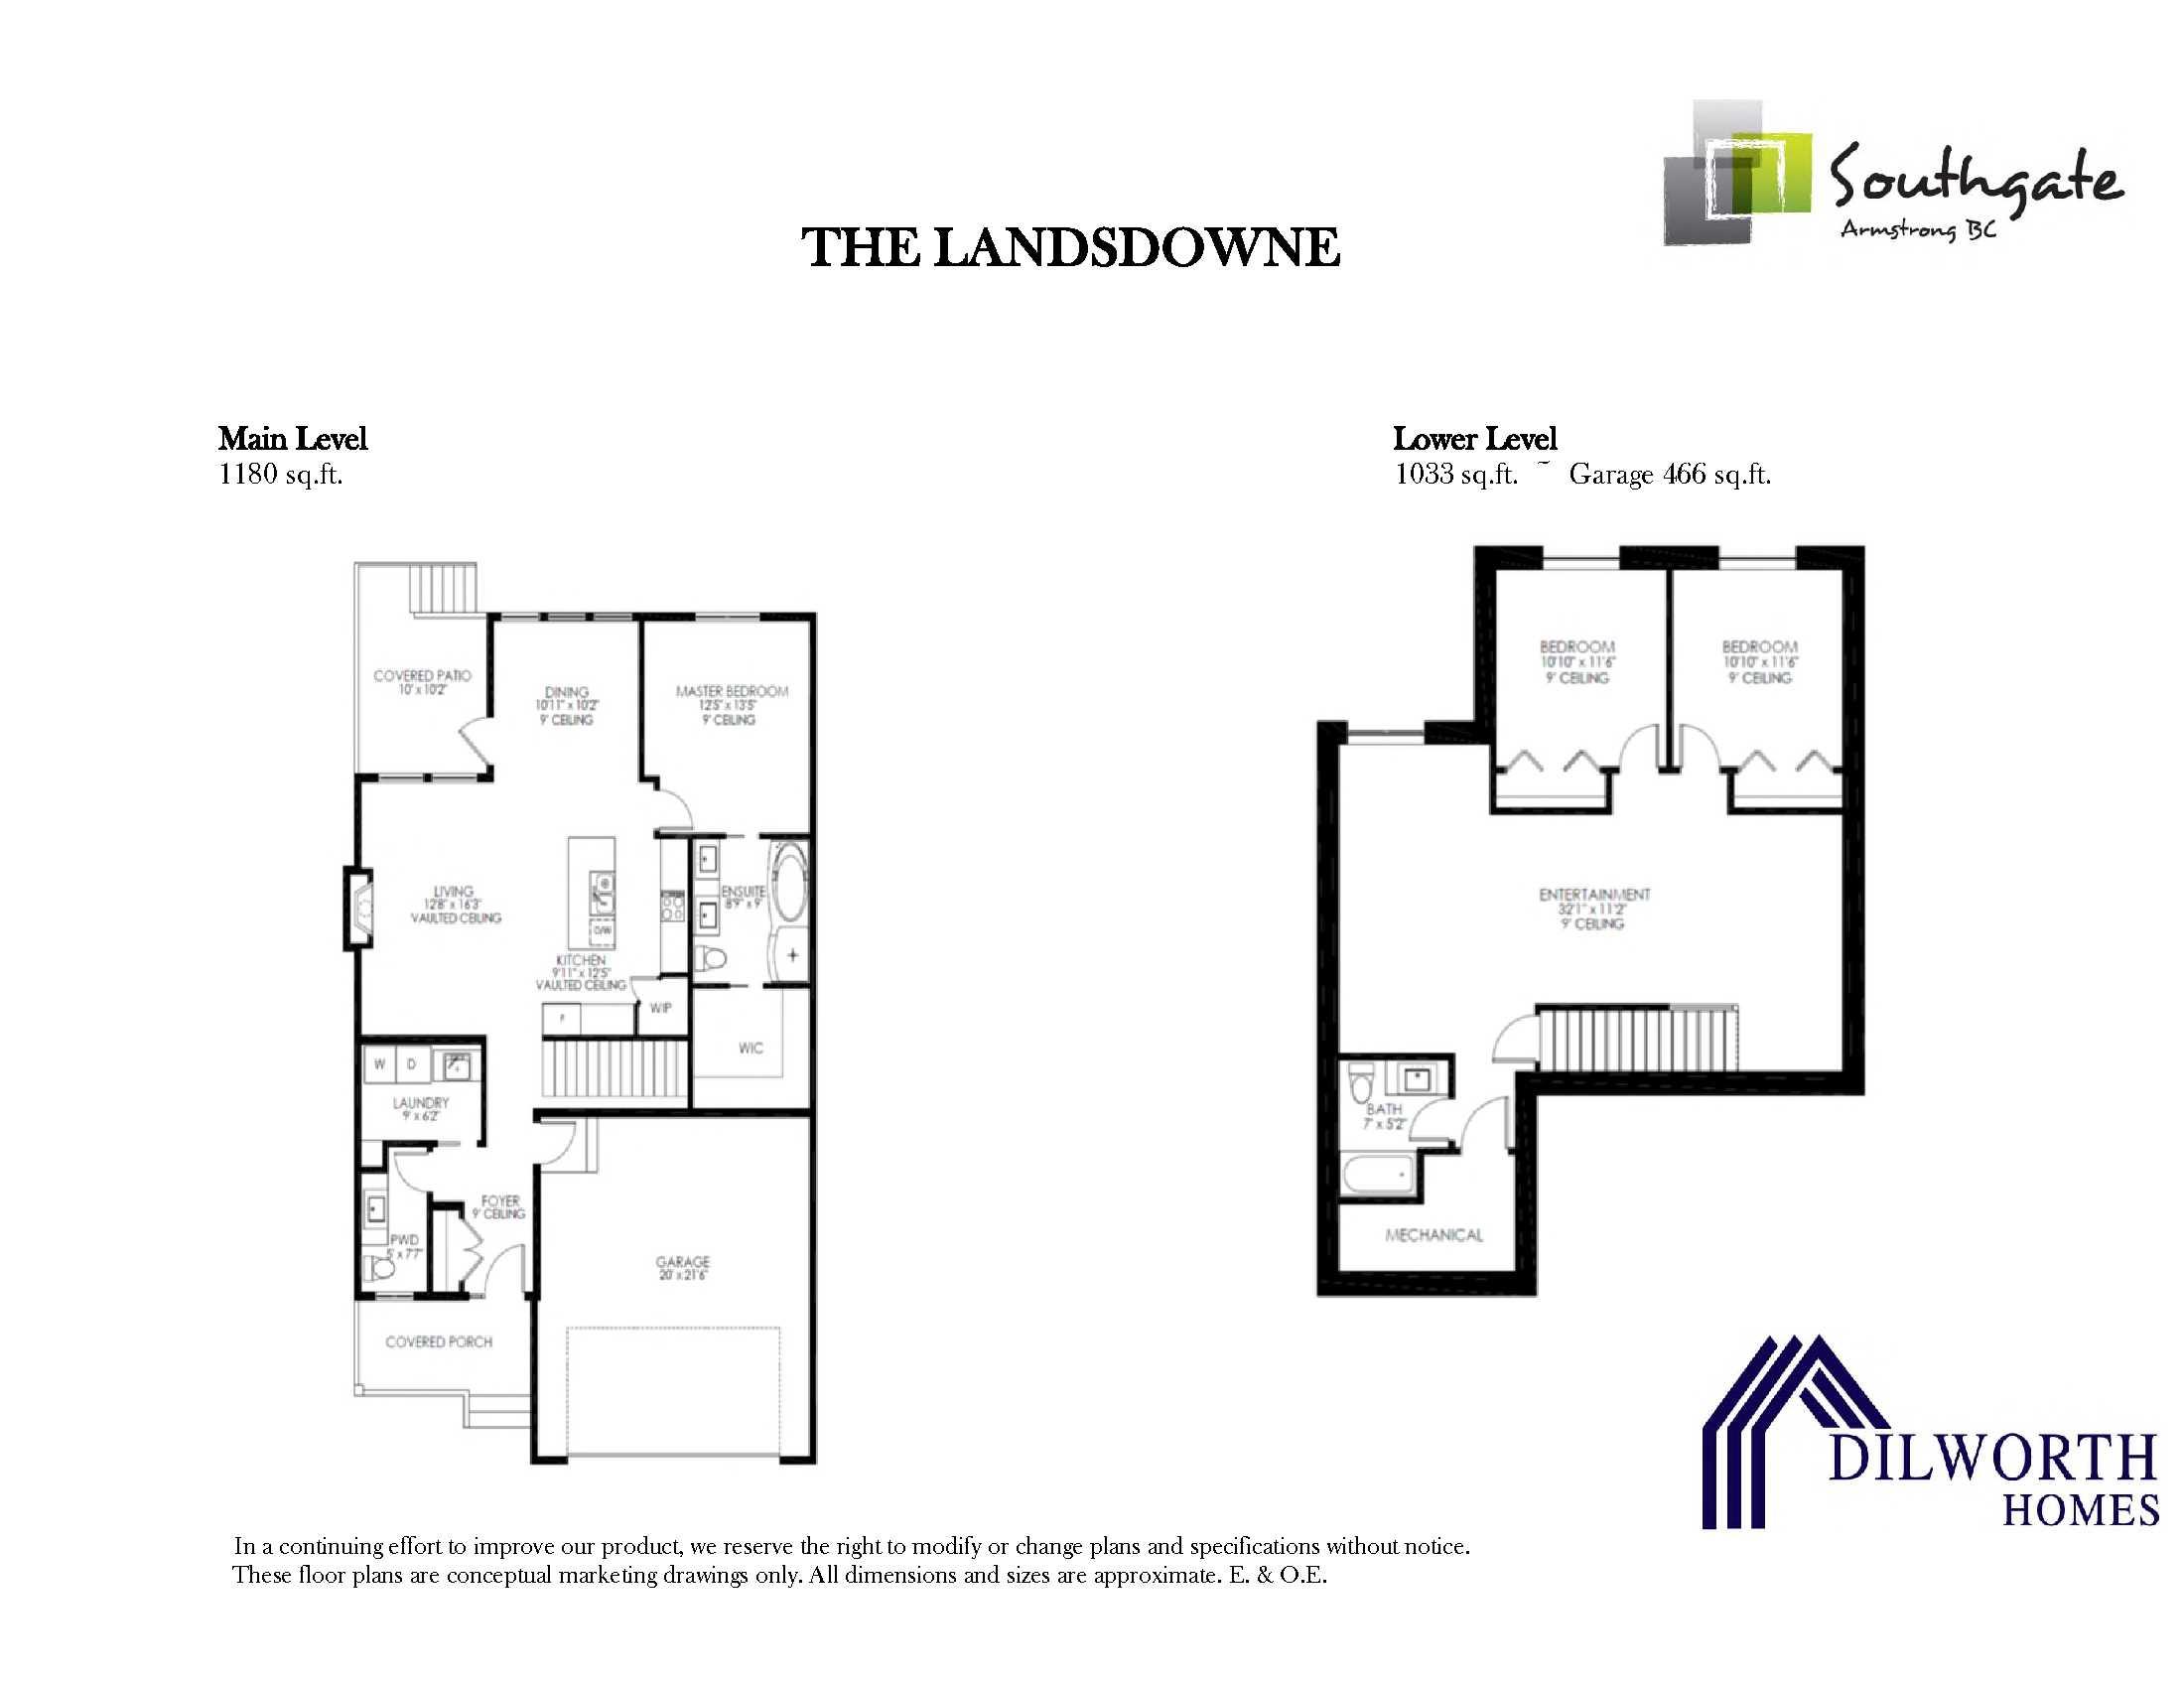 170428 SG2-08 Landsdowne – Dilworth Quality Homes